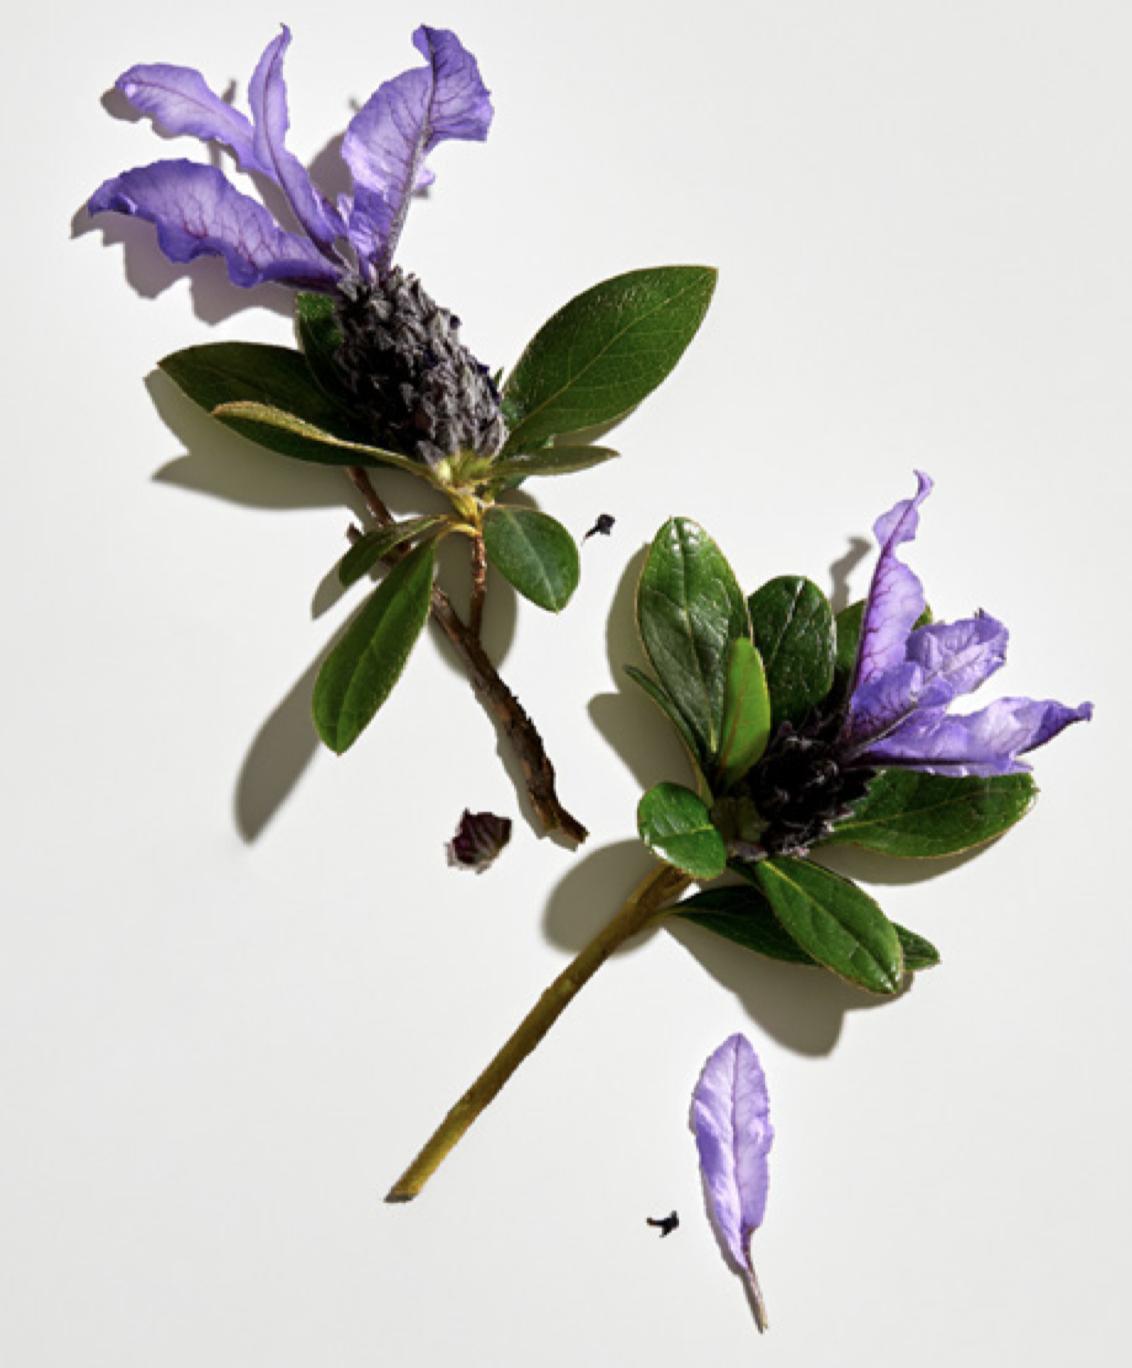 Babchi flower, source of bakuchiol